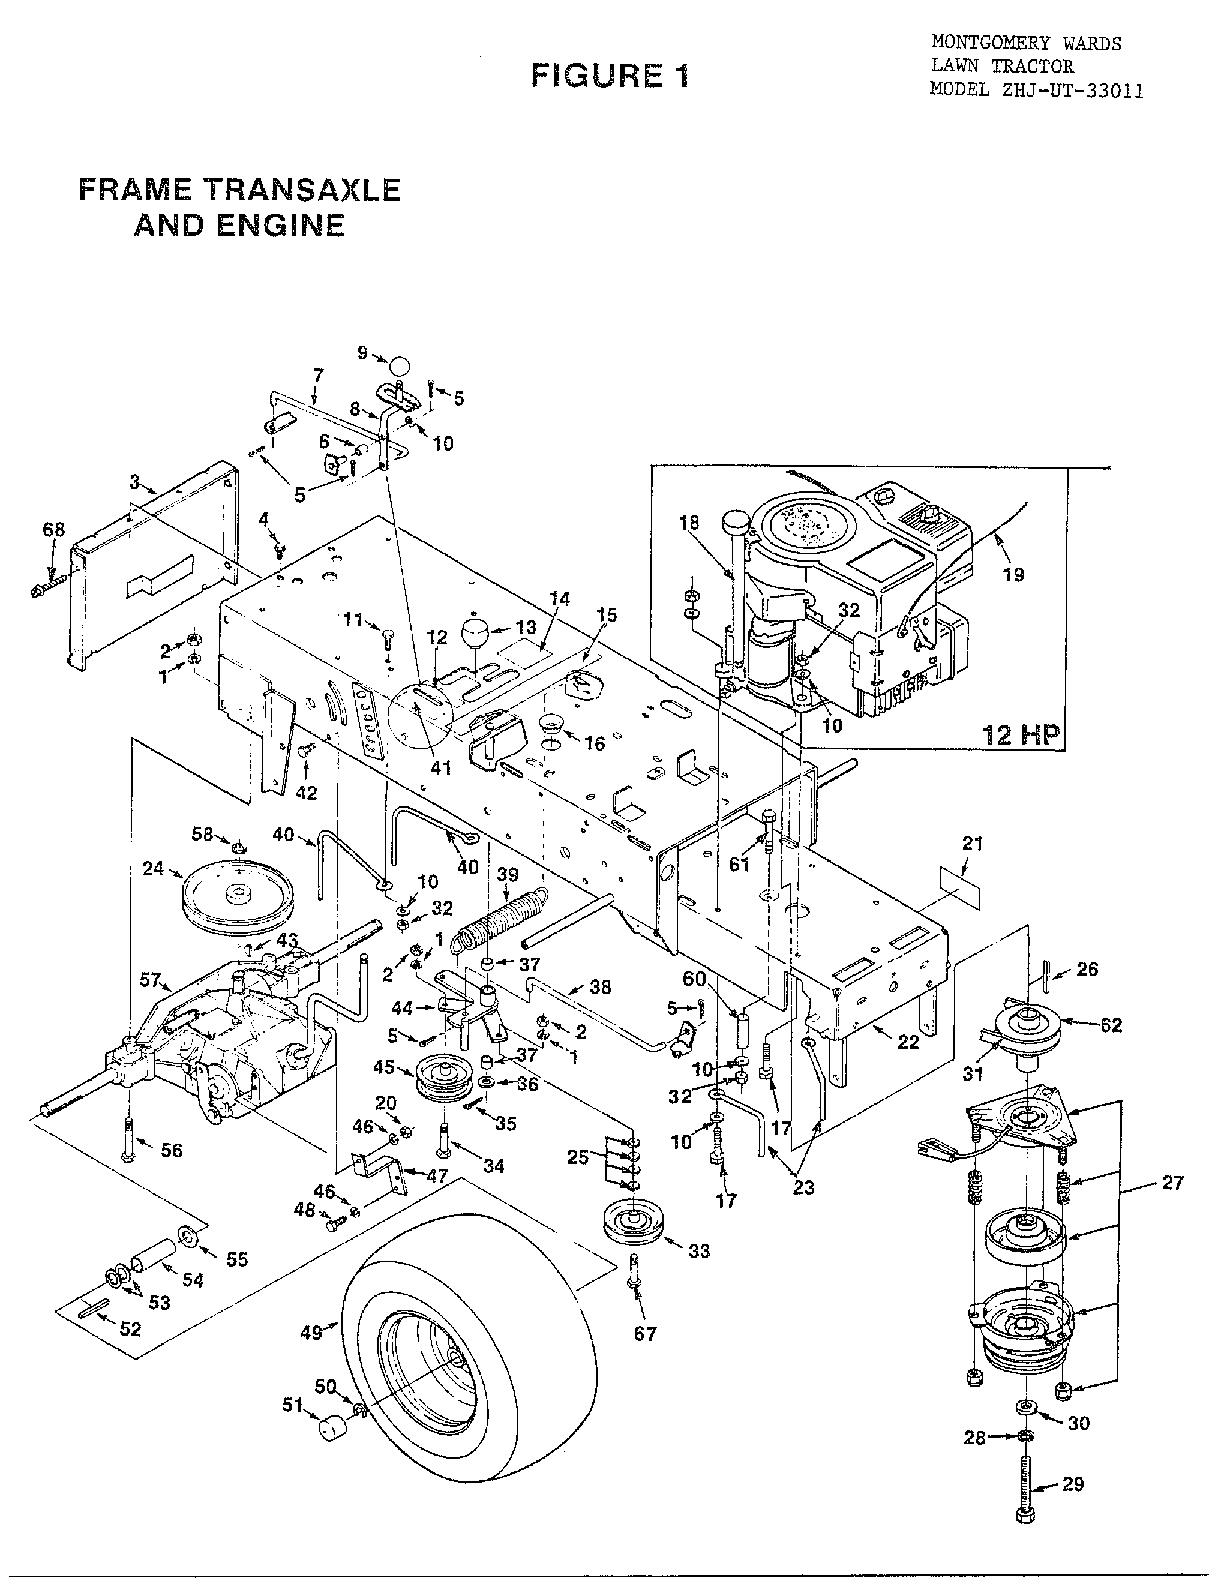 Homelite model UT33011 lawn, tractor genuine parts